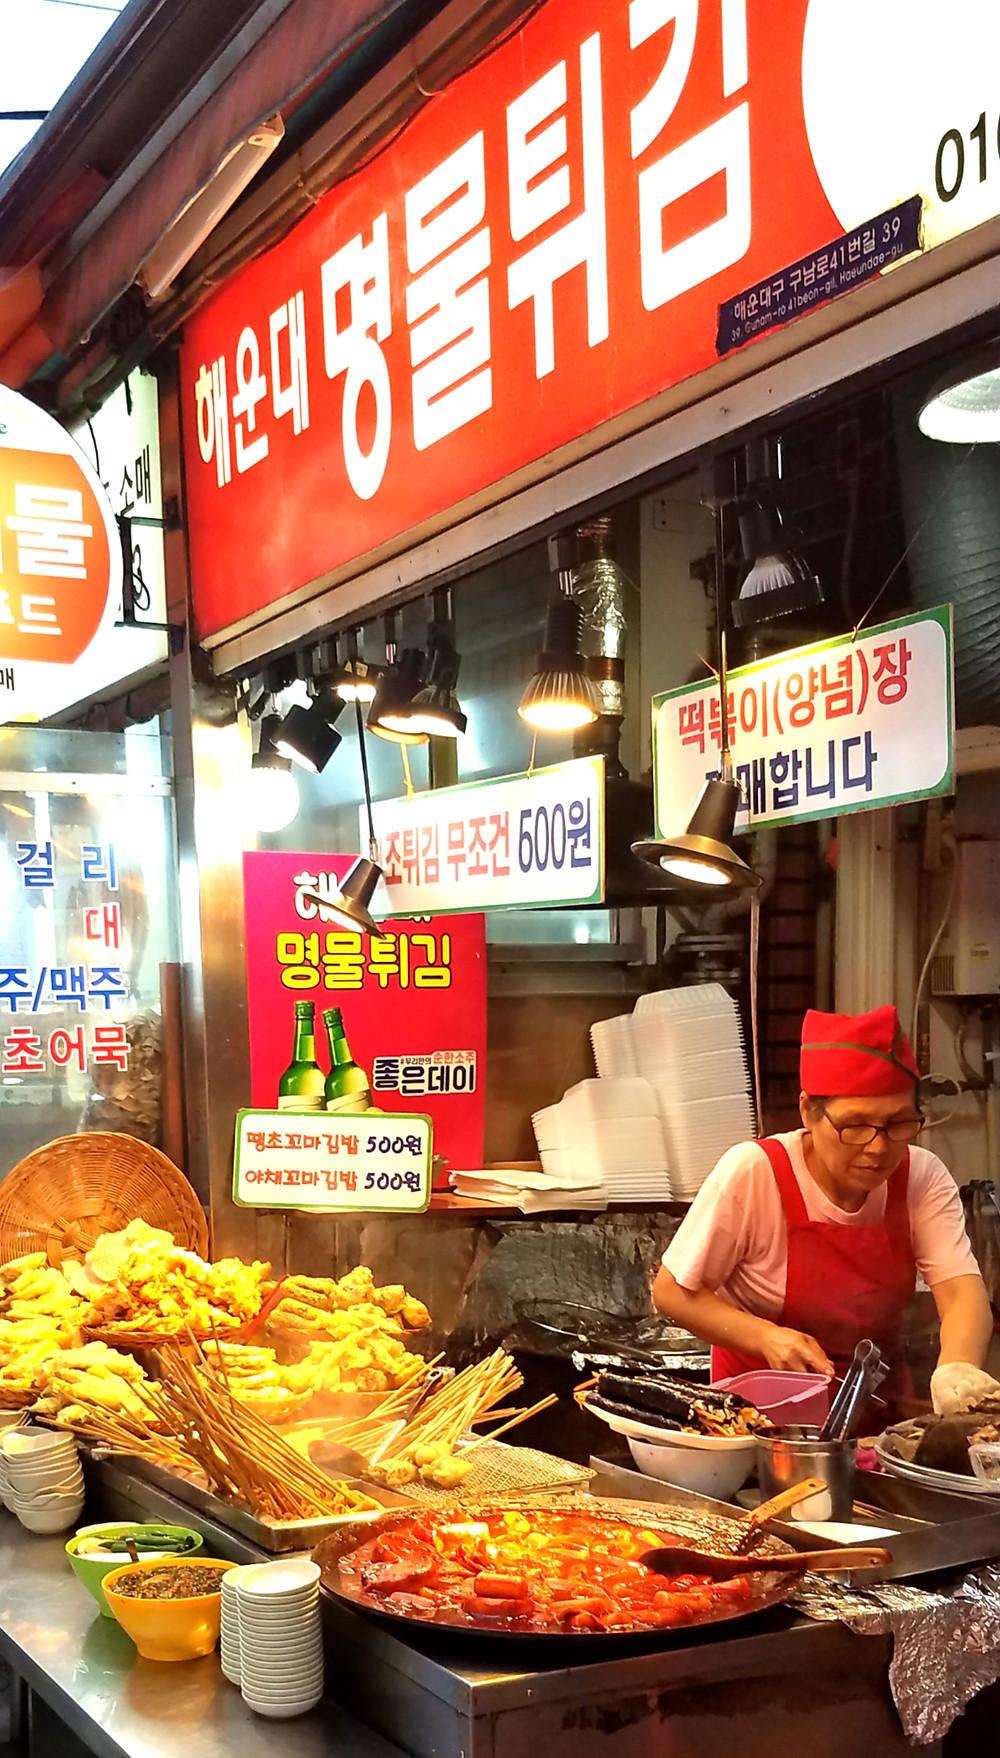 Street food in Busan, South Korea